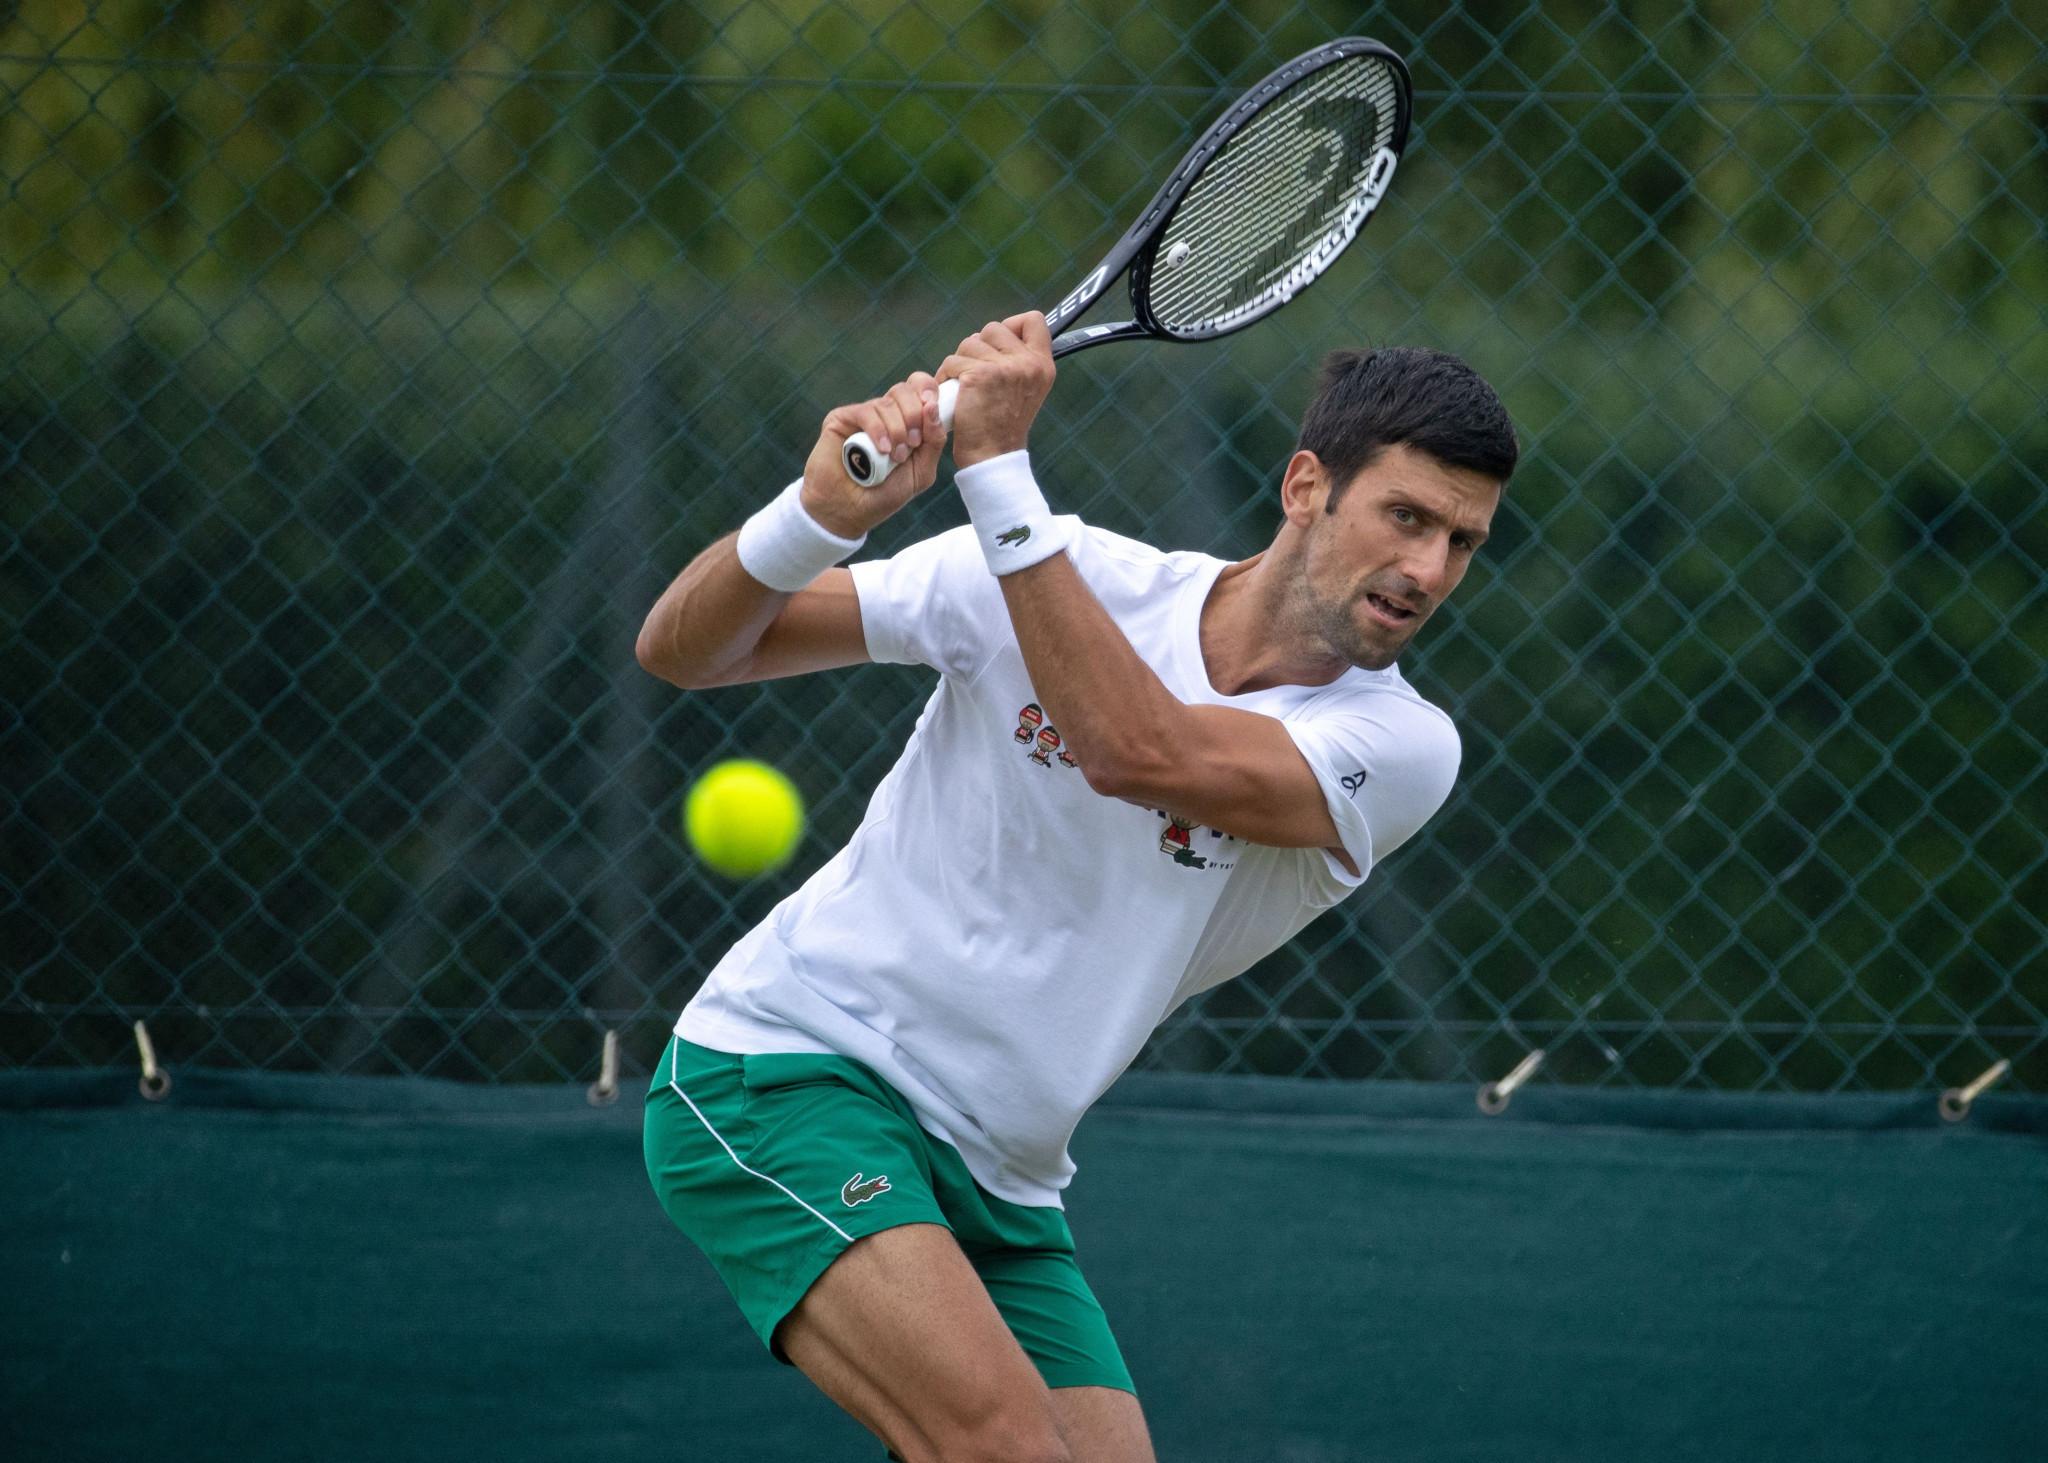 Djokovic eyes record-equalling 20th Grand Slam title at Wimbledon